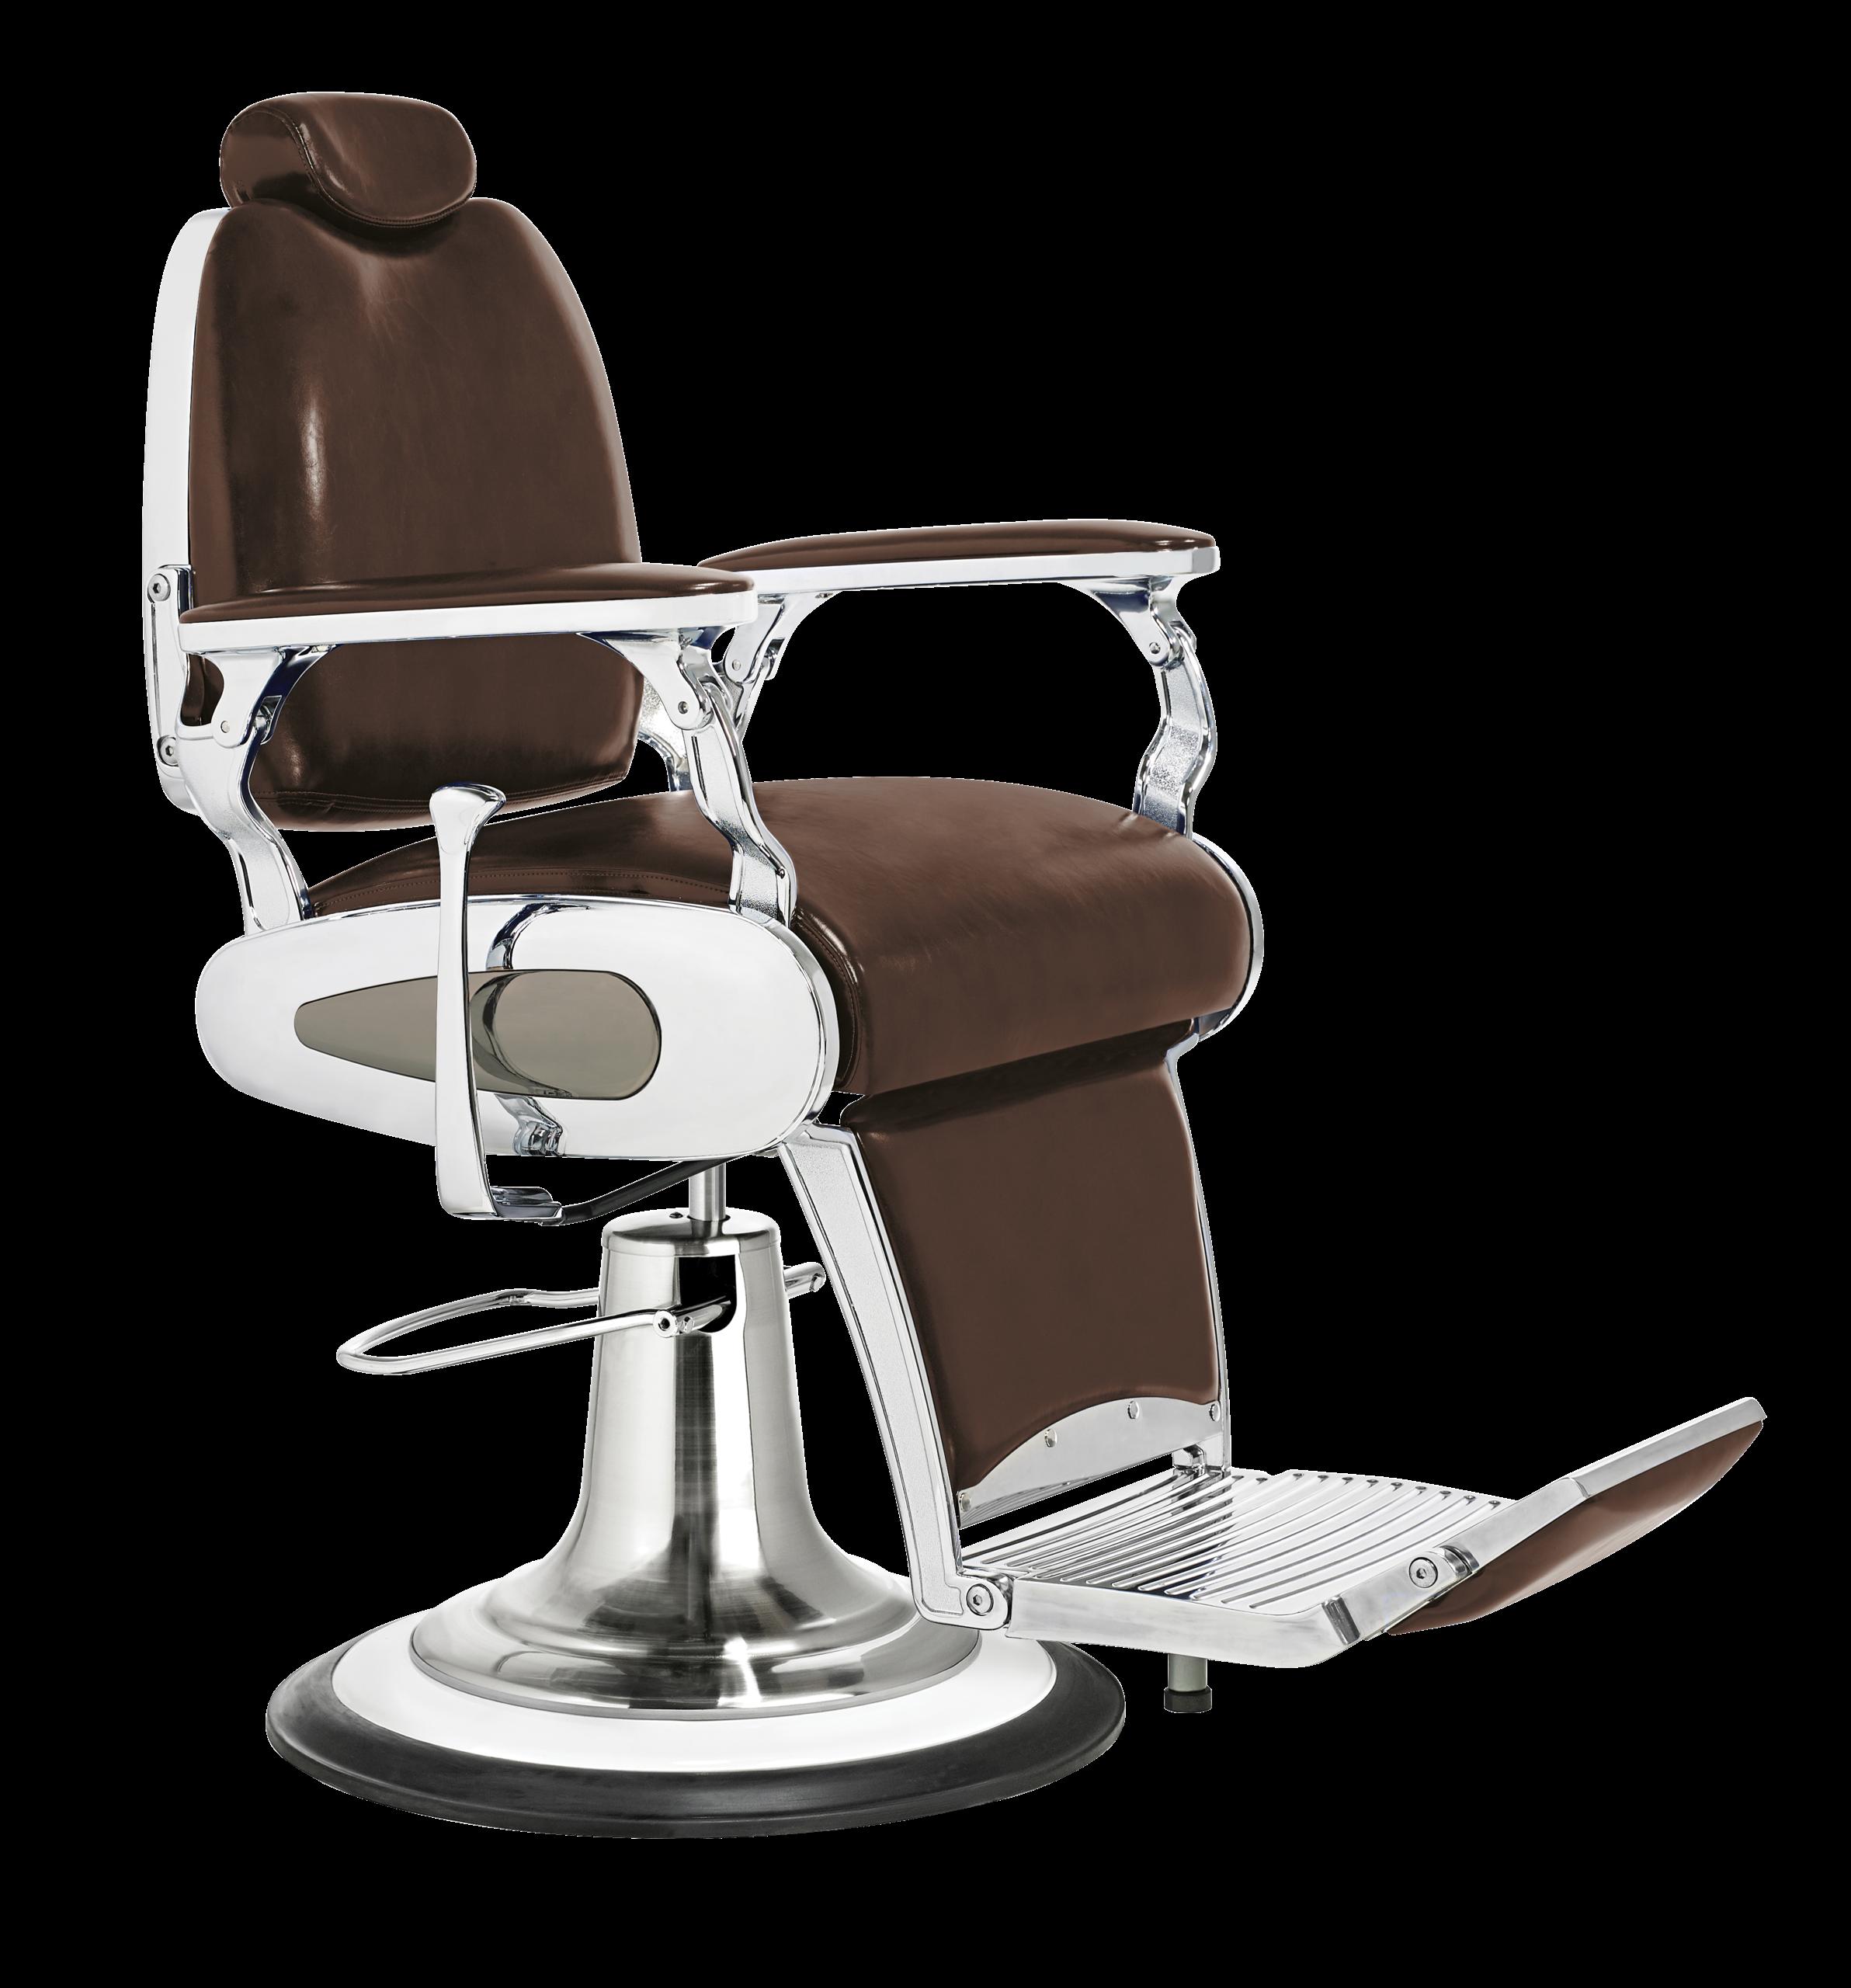 fauteuil barbier vintage milwaukee jacques seban baf4 jacques seban